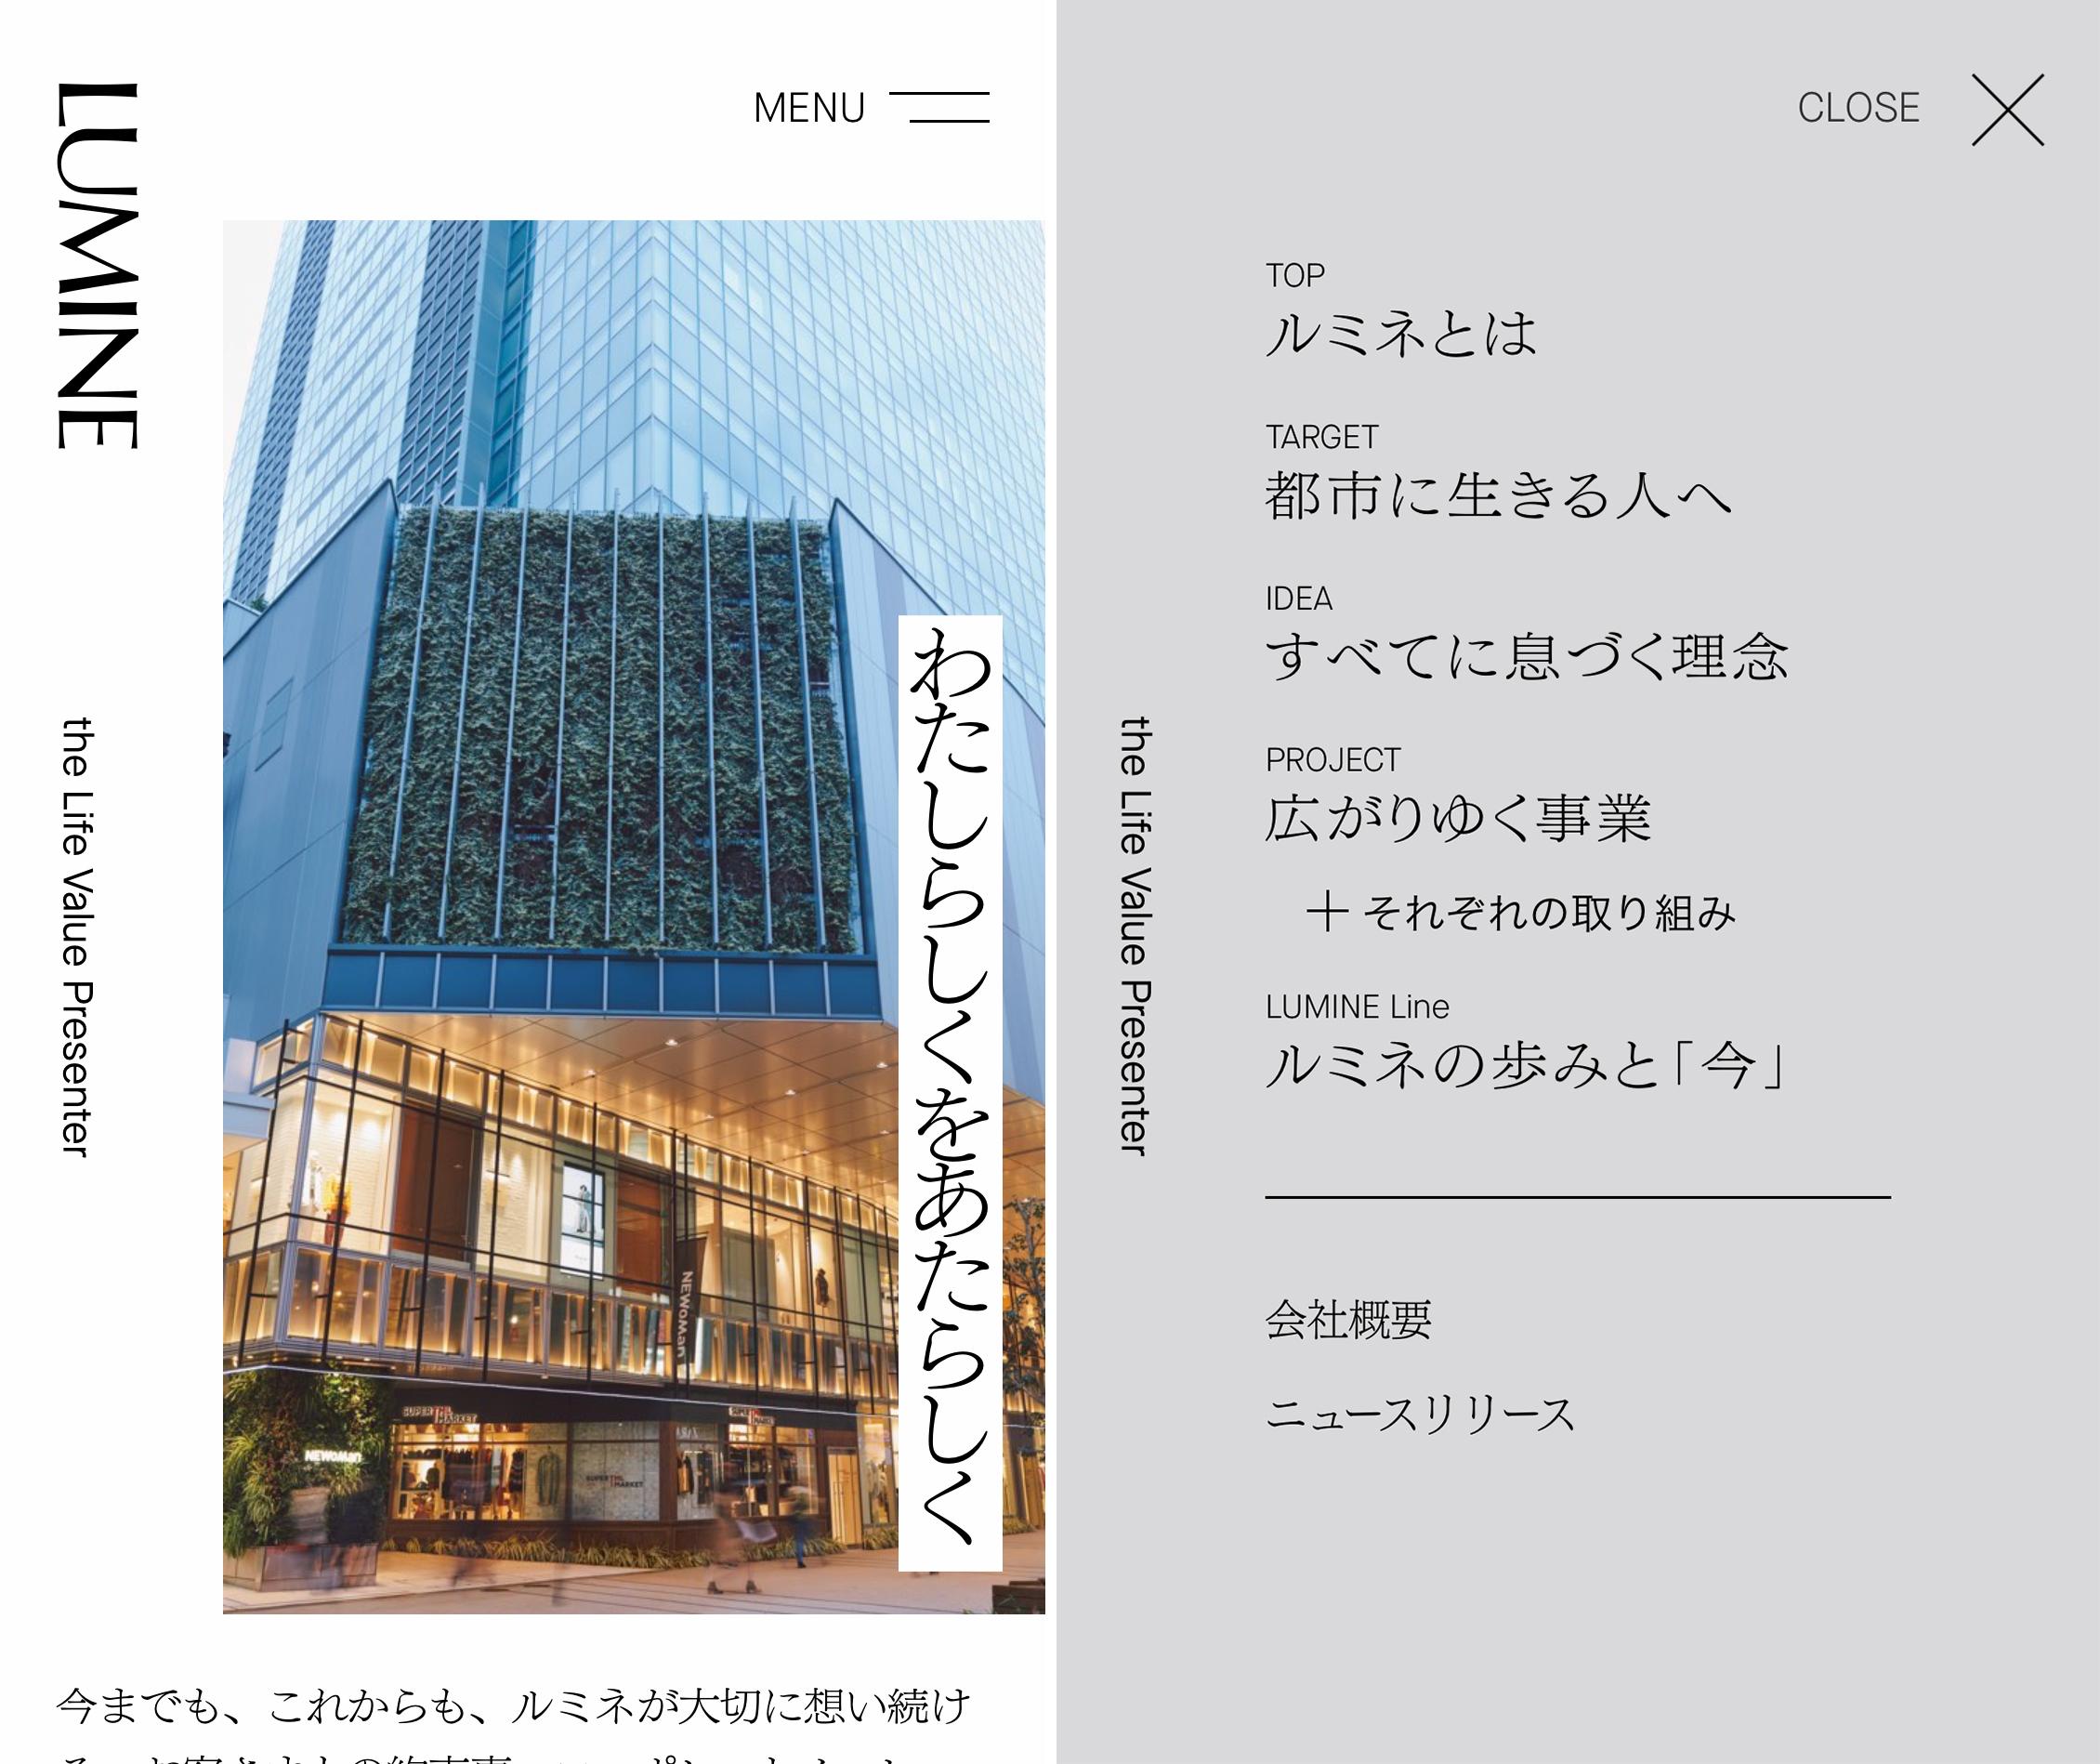 image_07.jpg